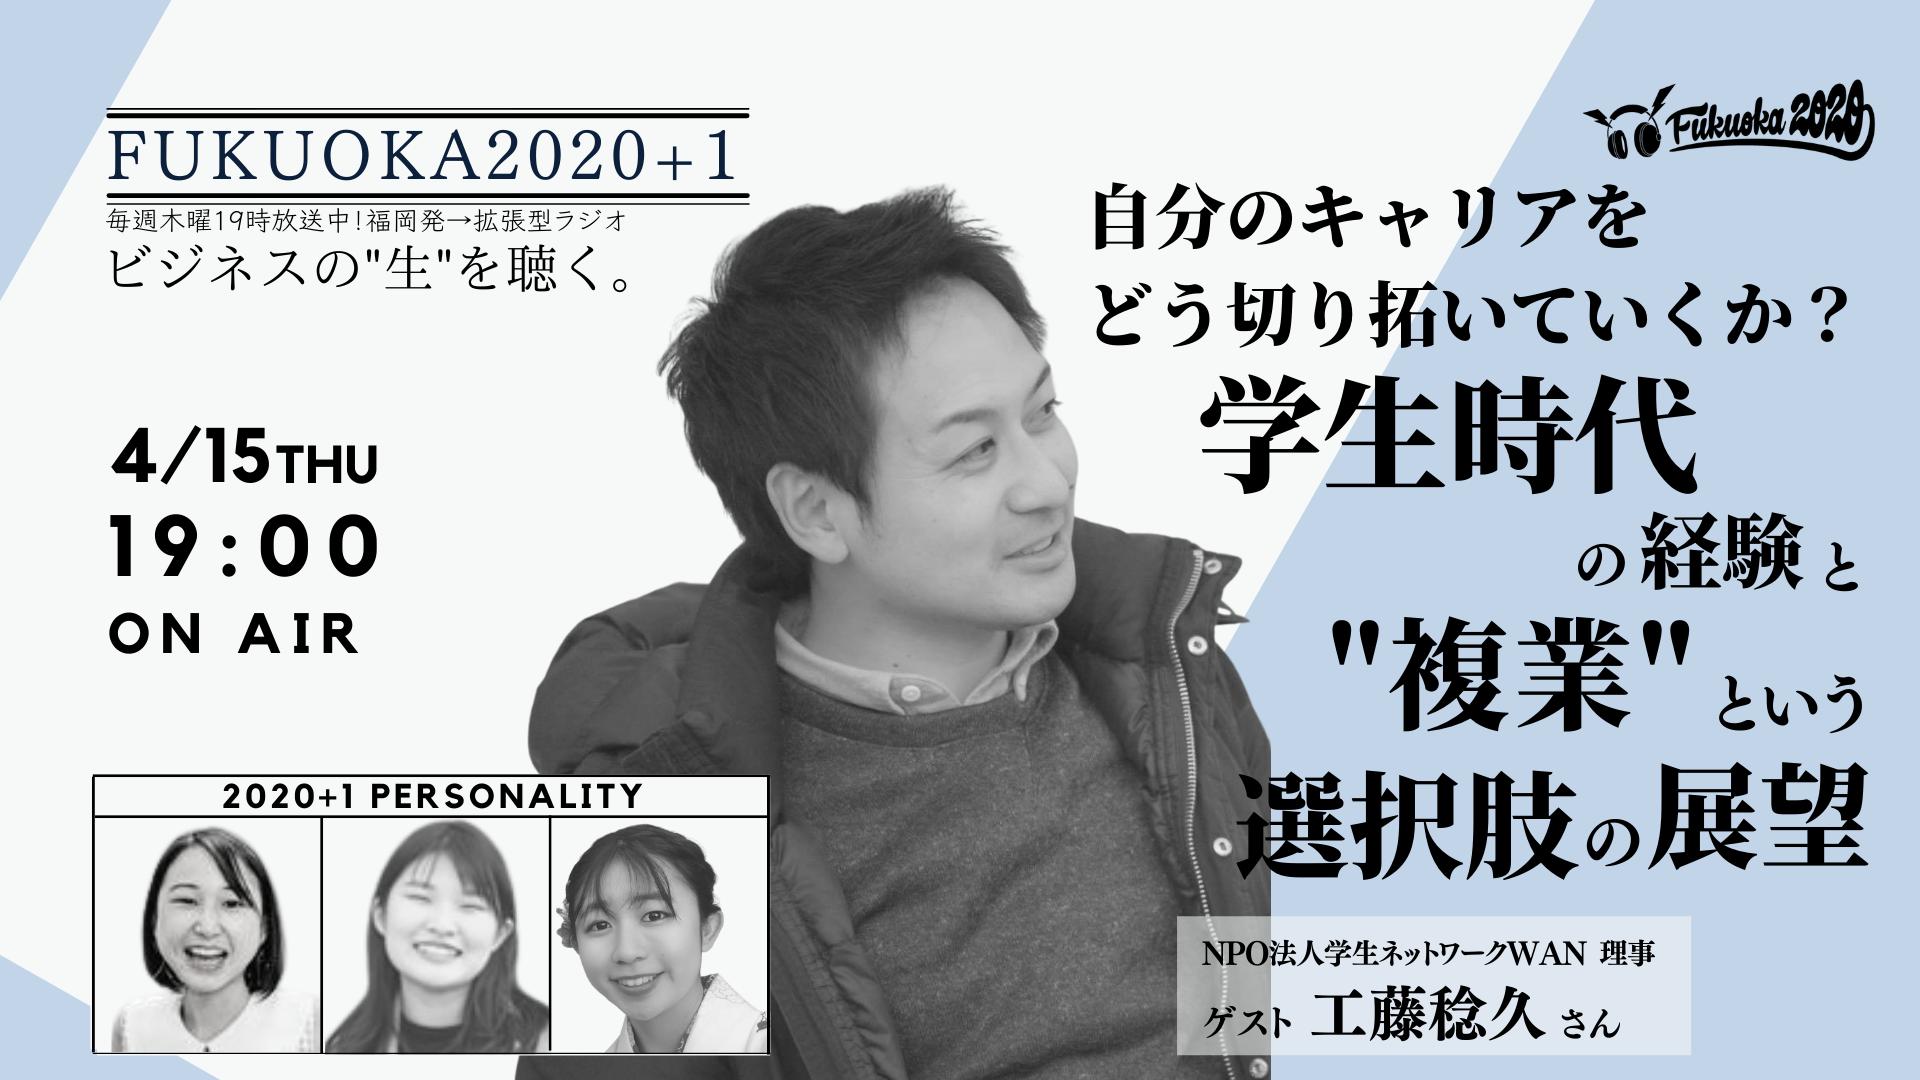 【LIVE】FUKUOKA2020 vol.133 |ゲスト:NPO法人学生ネットワークWAN 理事 工藤稔久さん